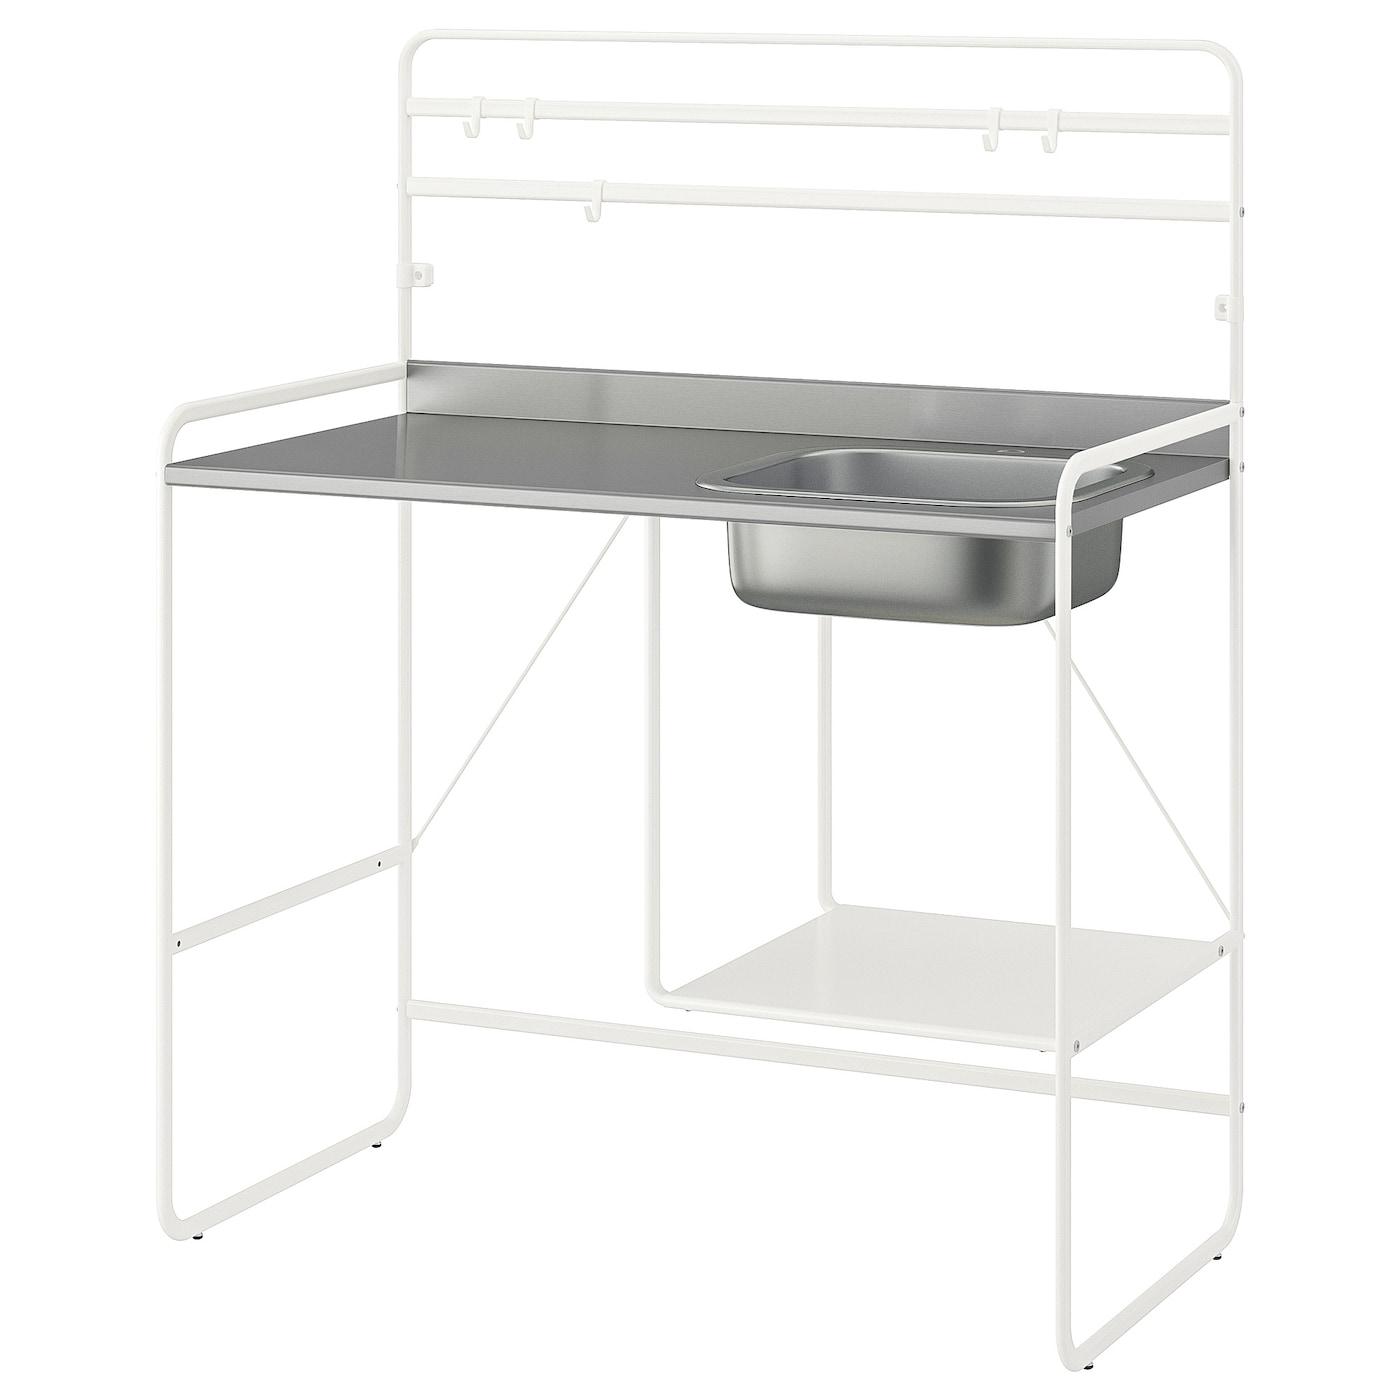 SUNNERSTA Mini-kitchen 4x4x4 cm